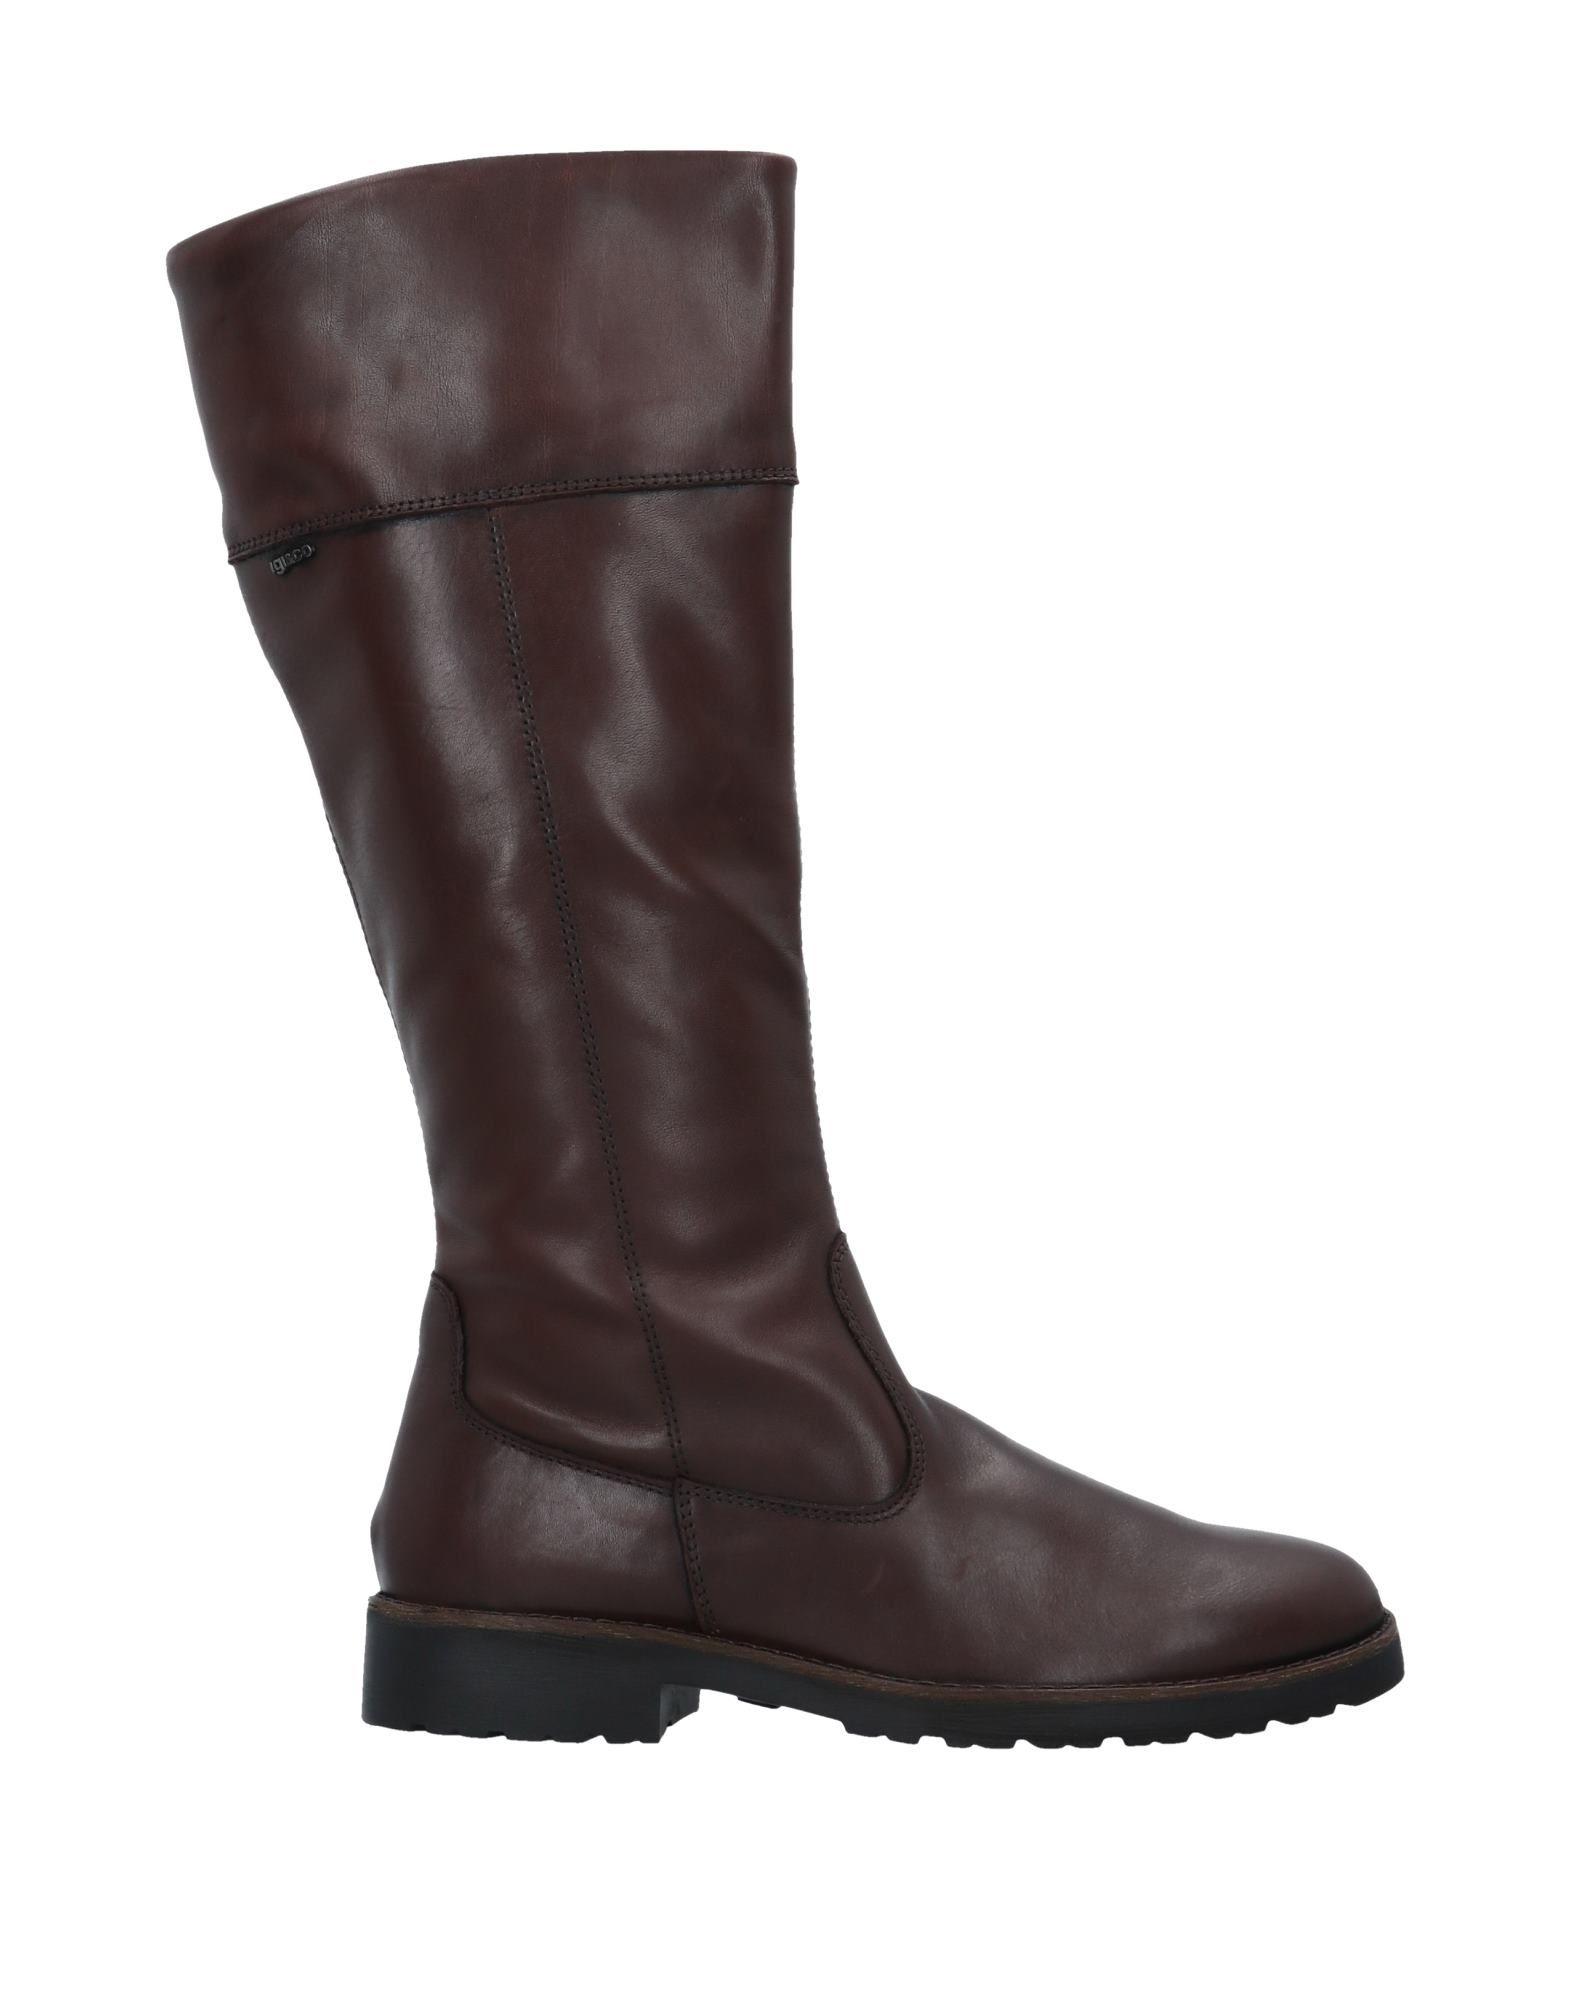 Moda Stivali Igi&Co Igi&Co Stivali Donna - 11535151SL 4781f6